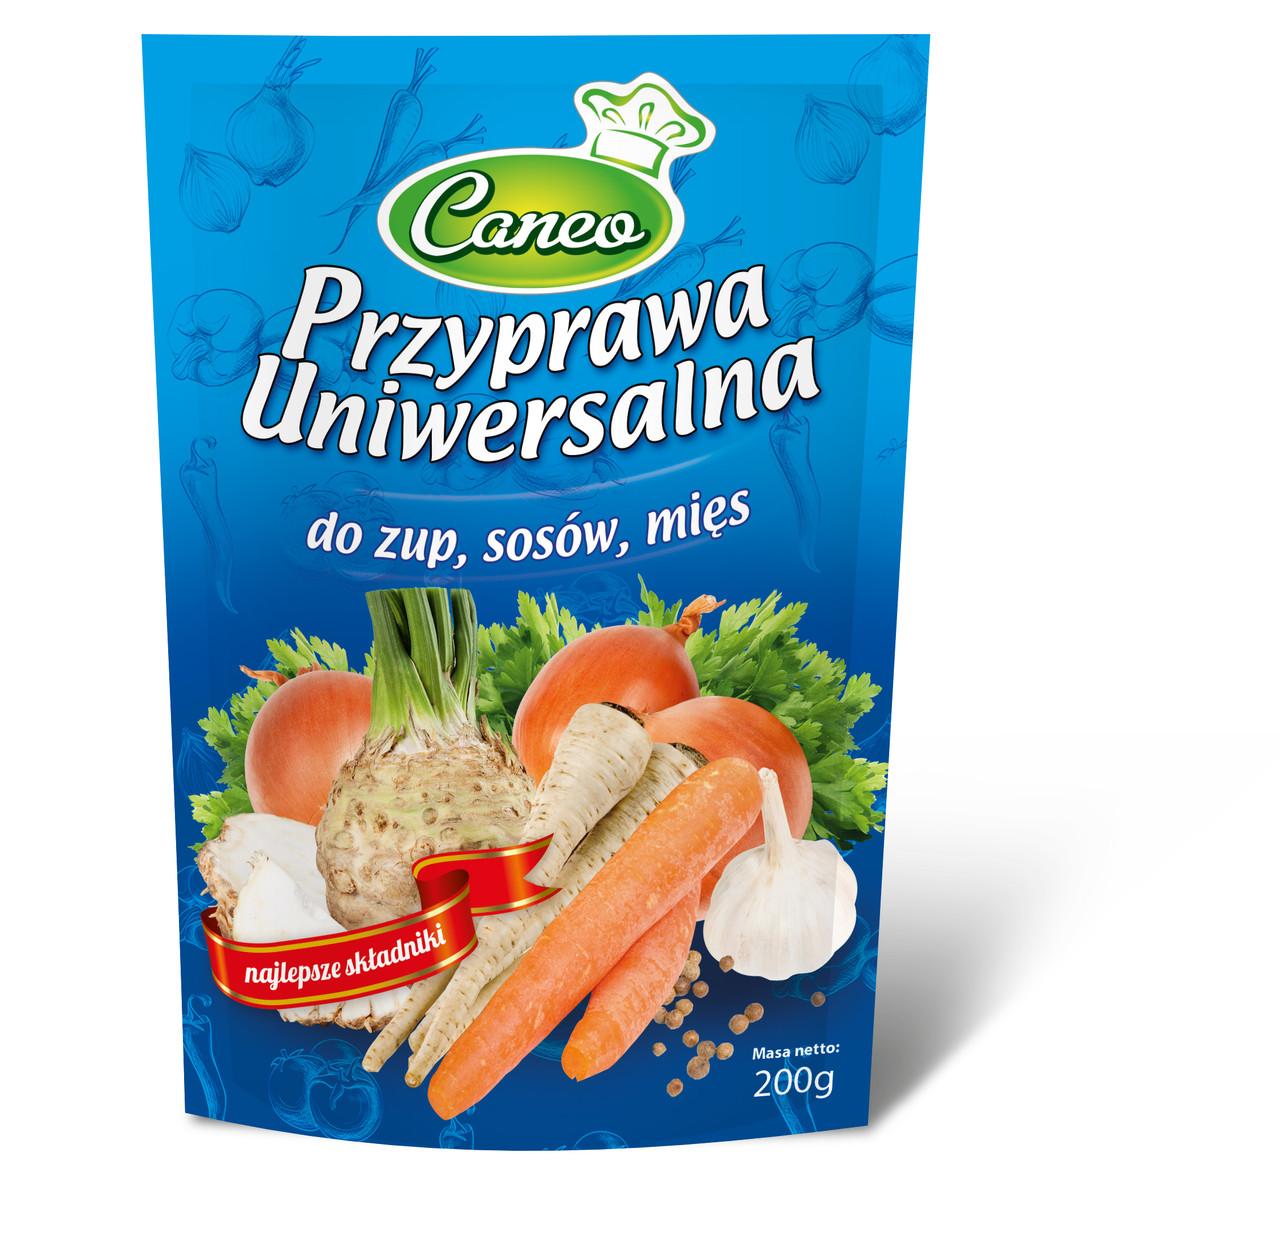 Caneo Przyprawa Uniwersalna — приправа универсальная, 200 гр.